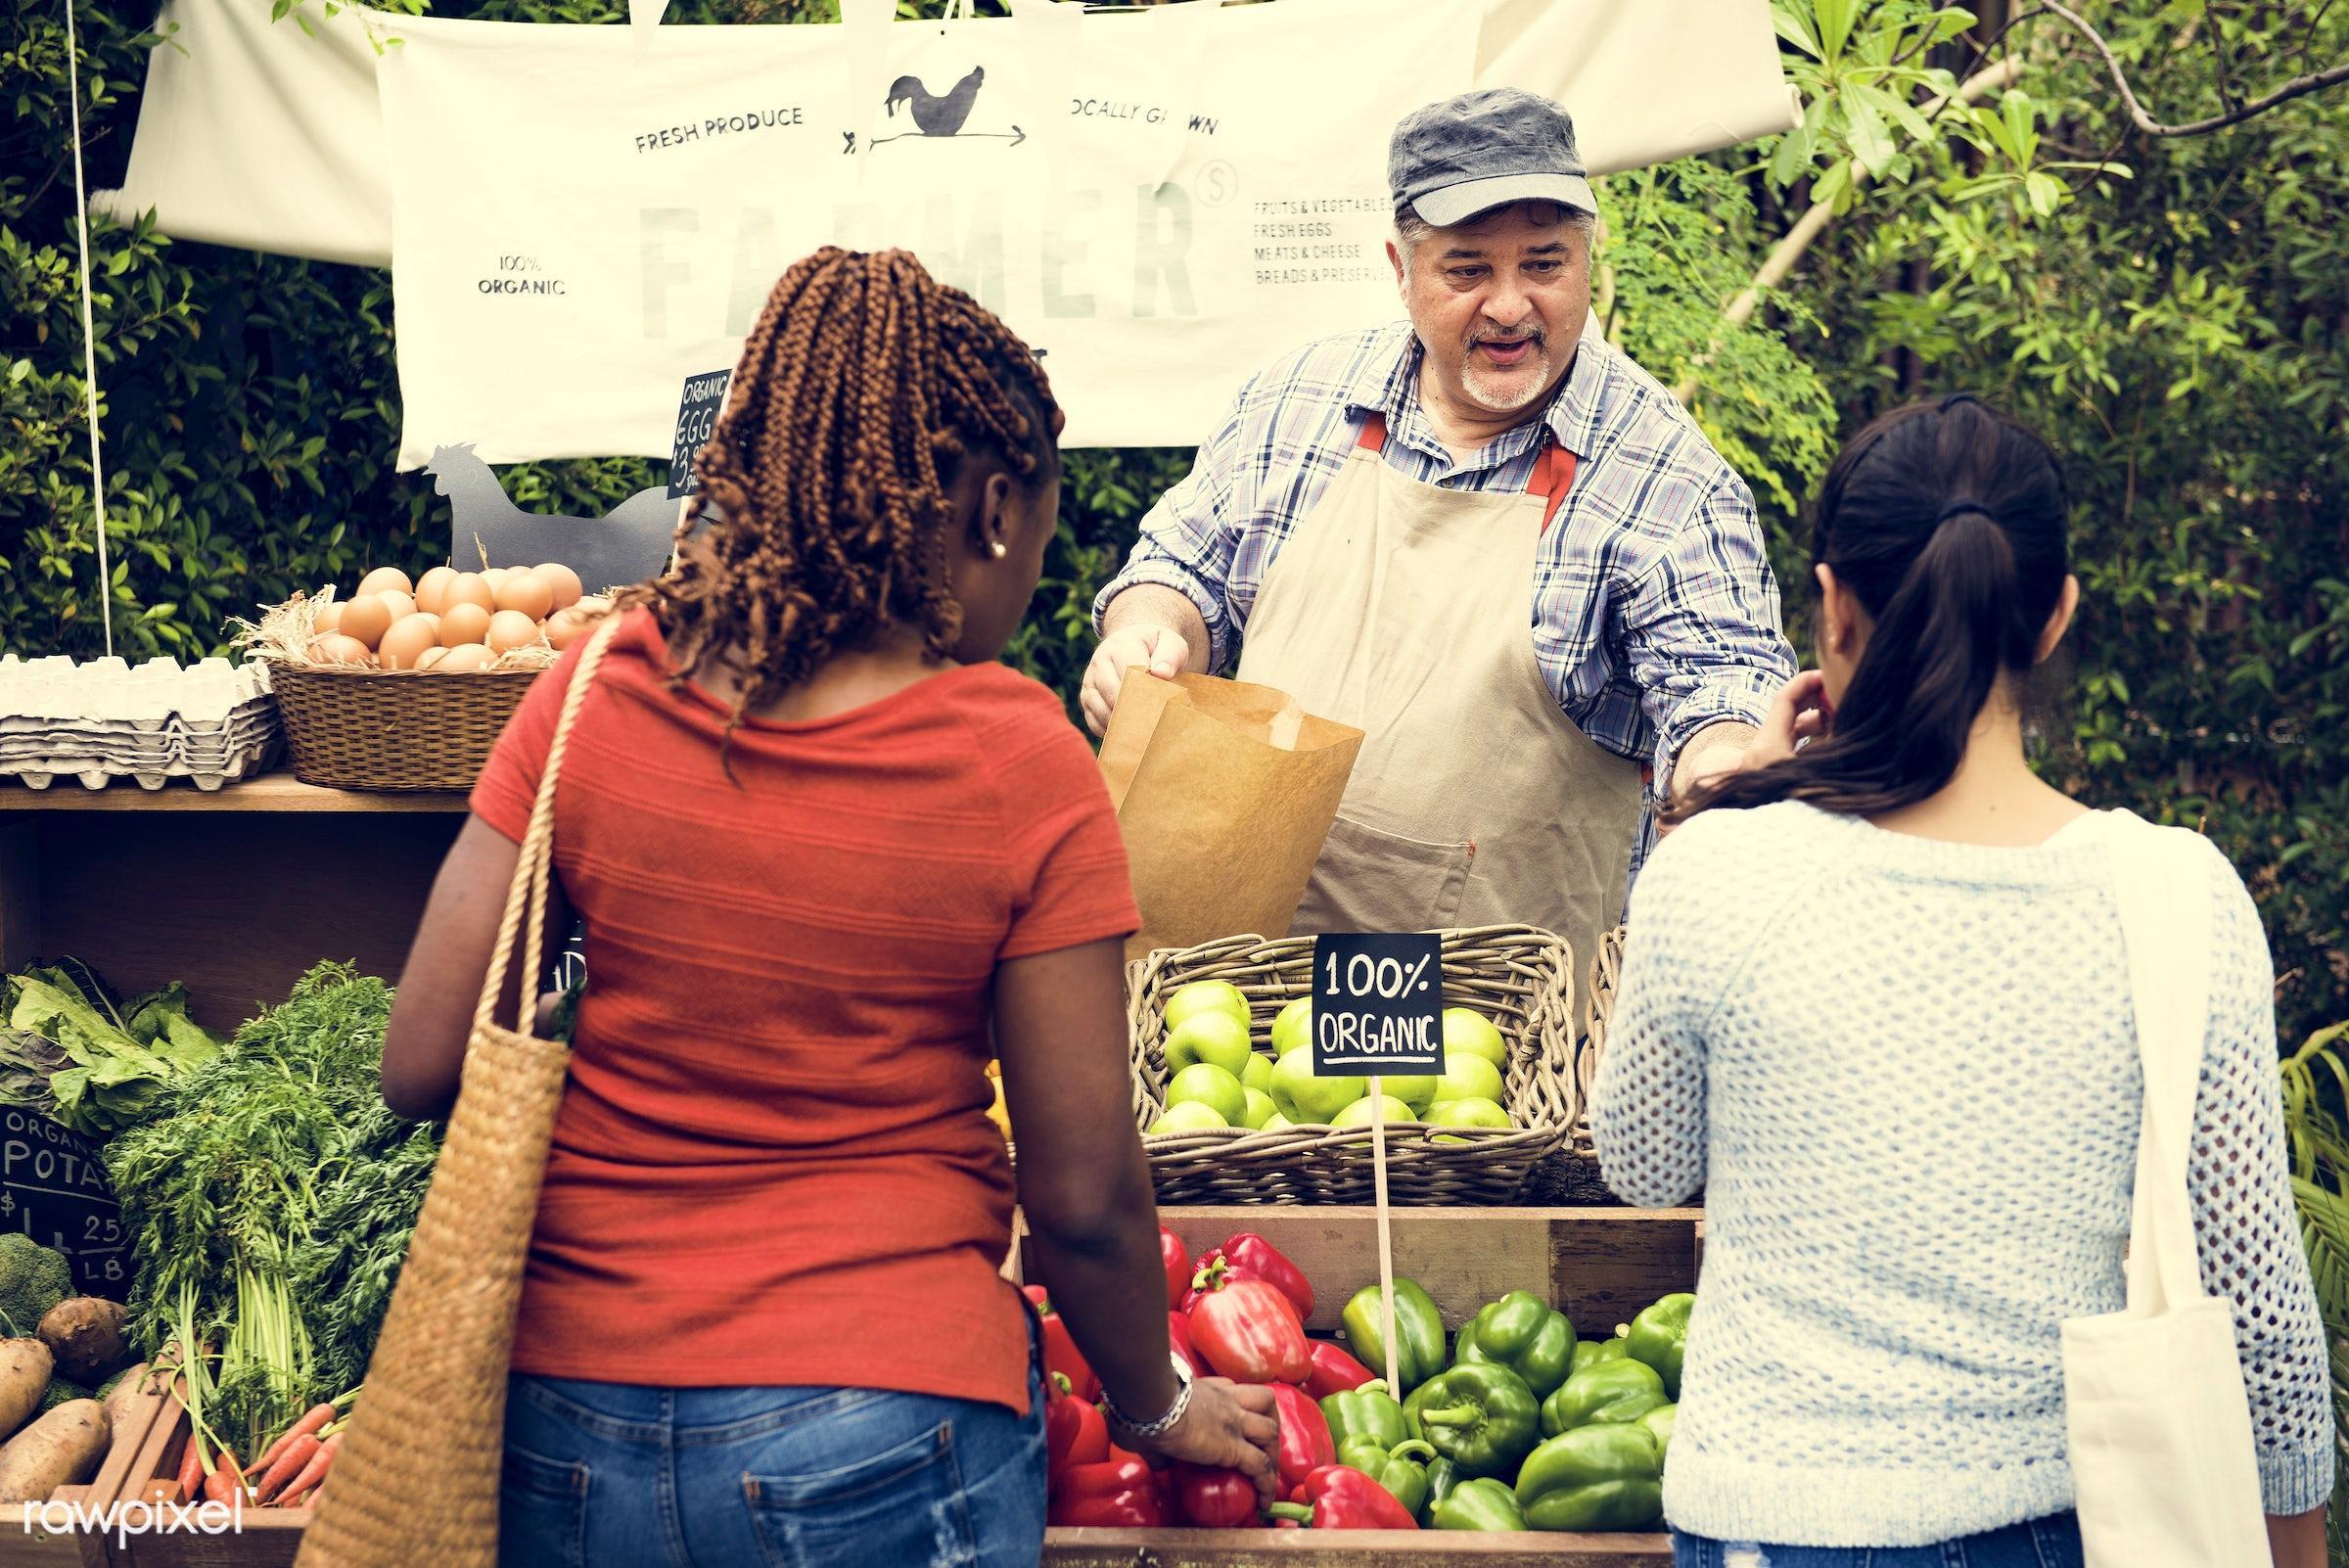 festive, shop, stall, store, catering, diverse, customer, people, business, farm, fresh, woman, wellness, festival, men,...